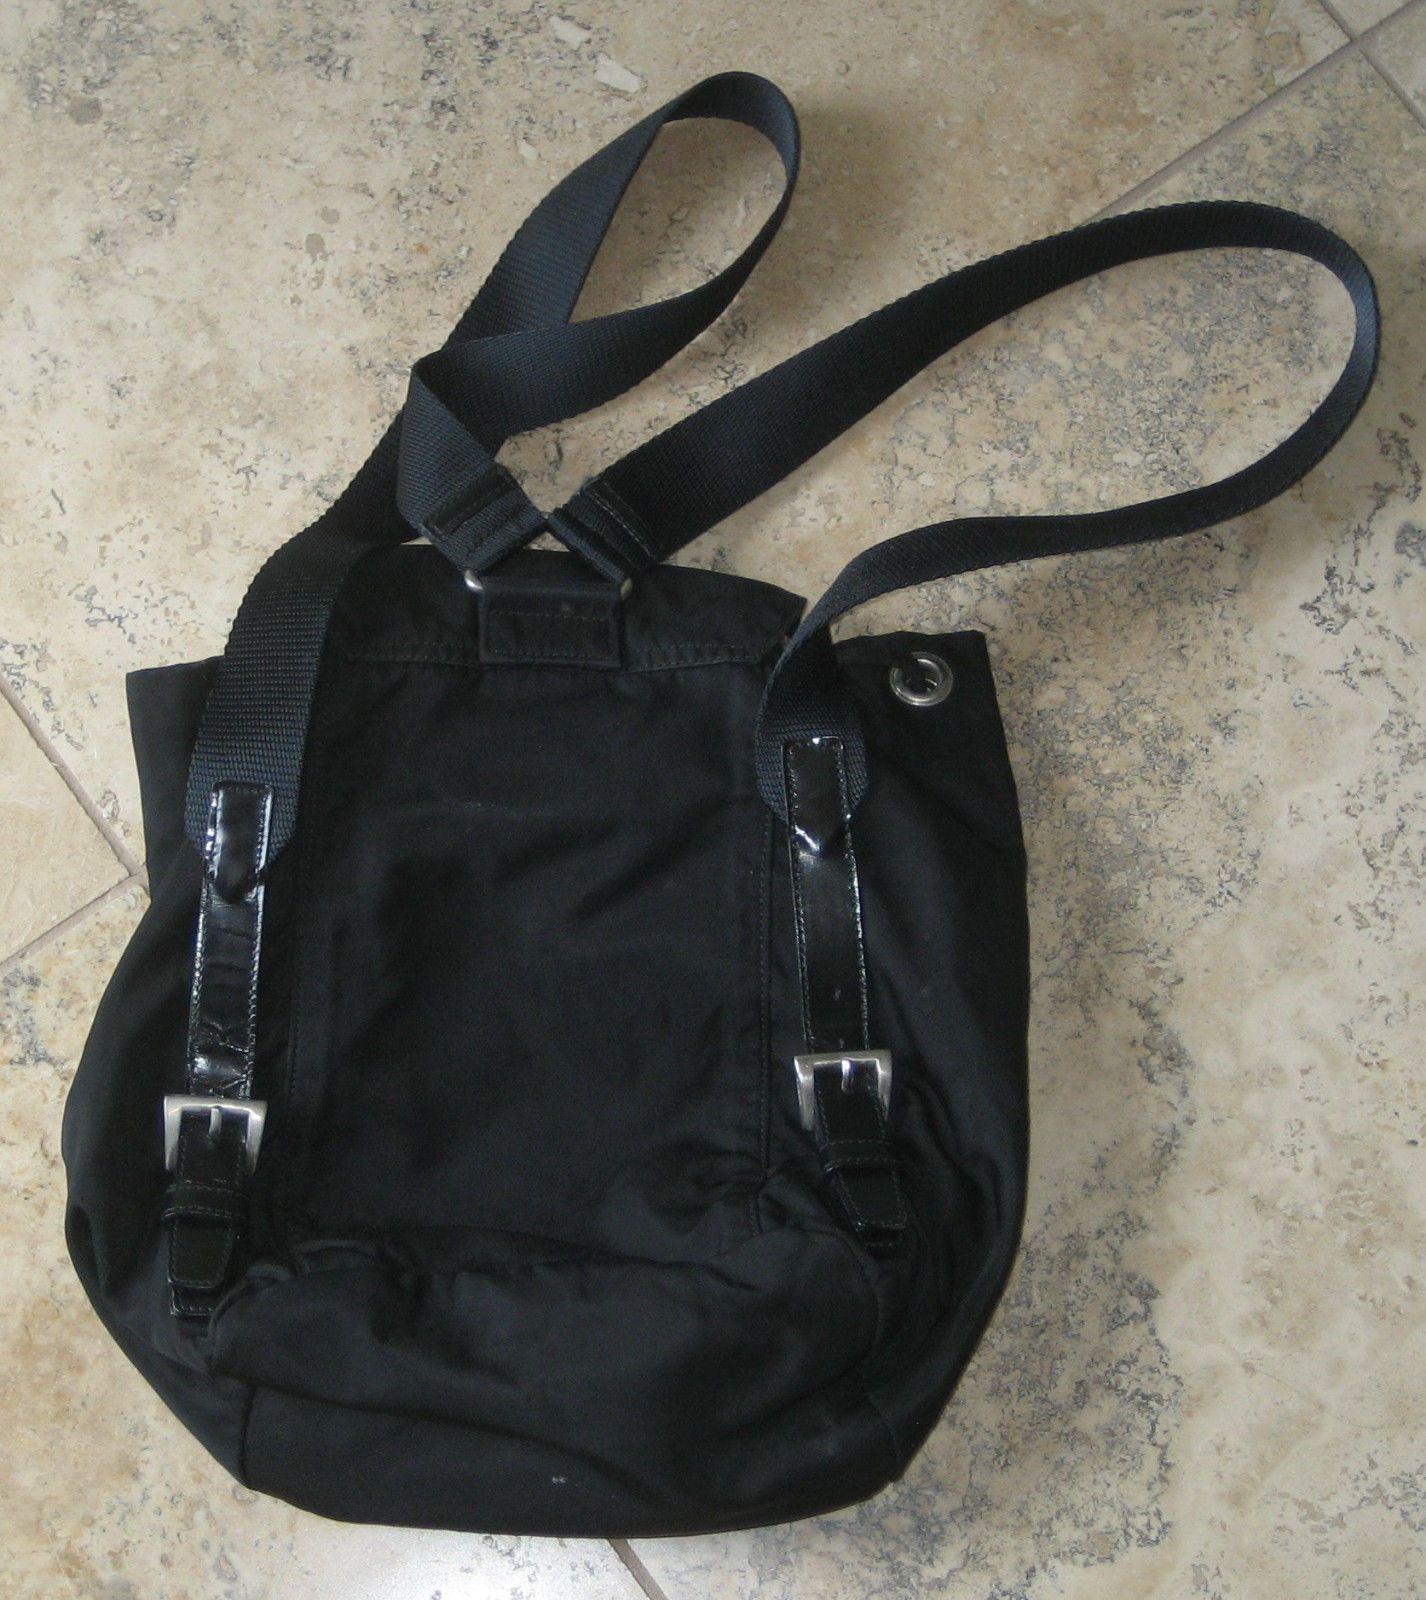 Black prada nylon backpack style purse prada milano made in italy 230 0